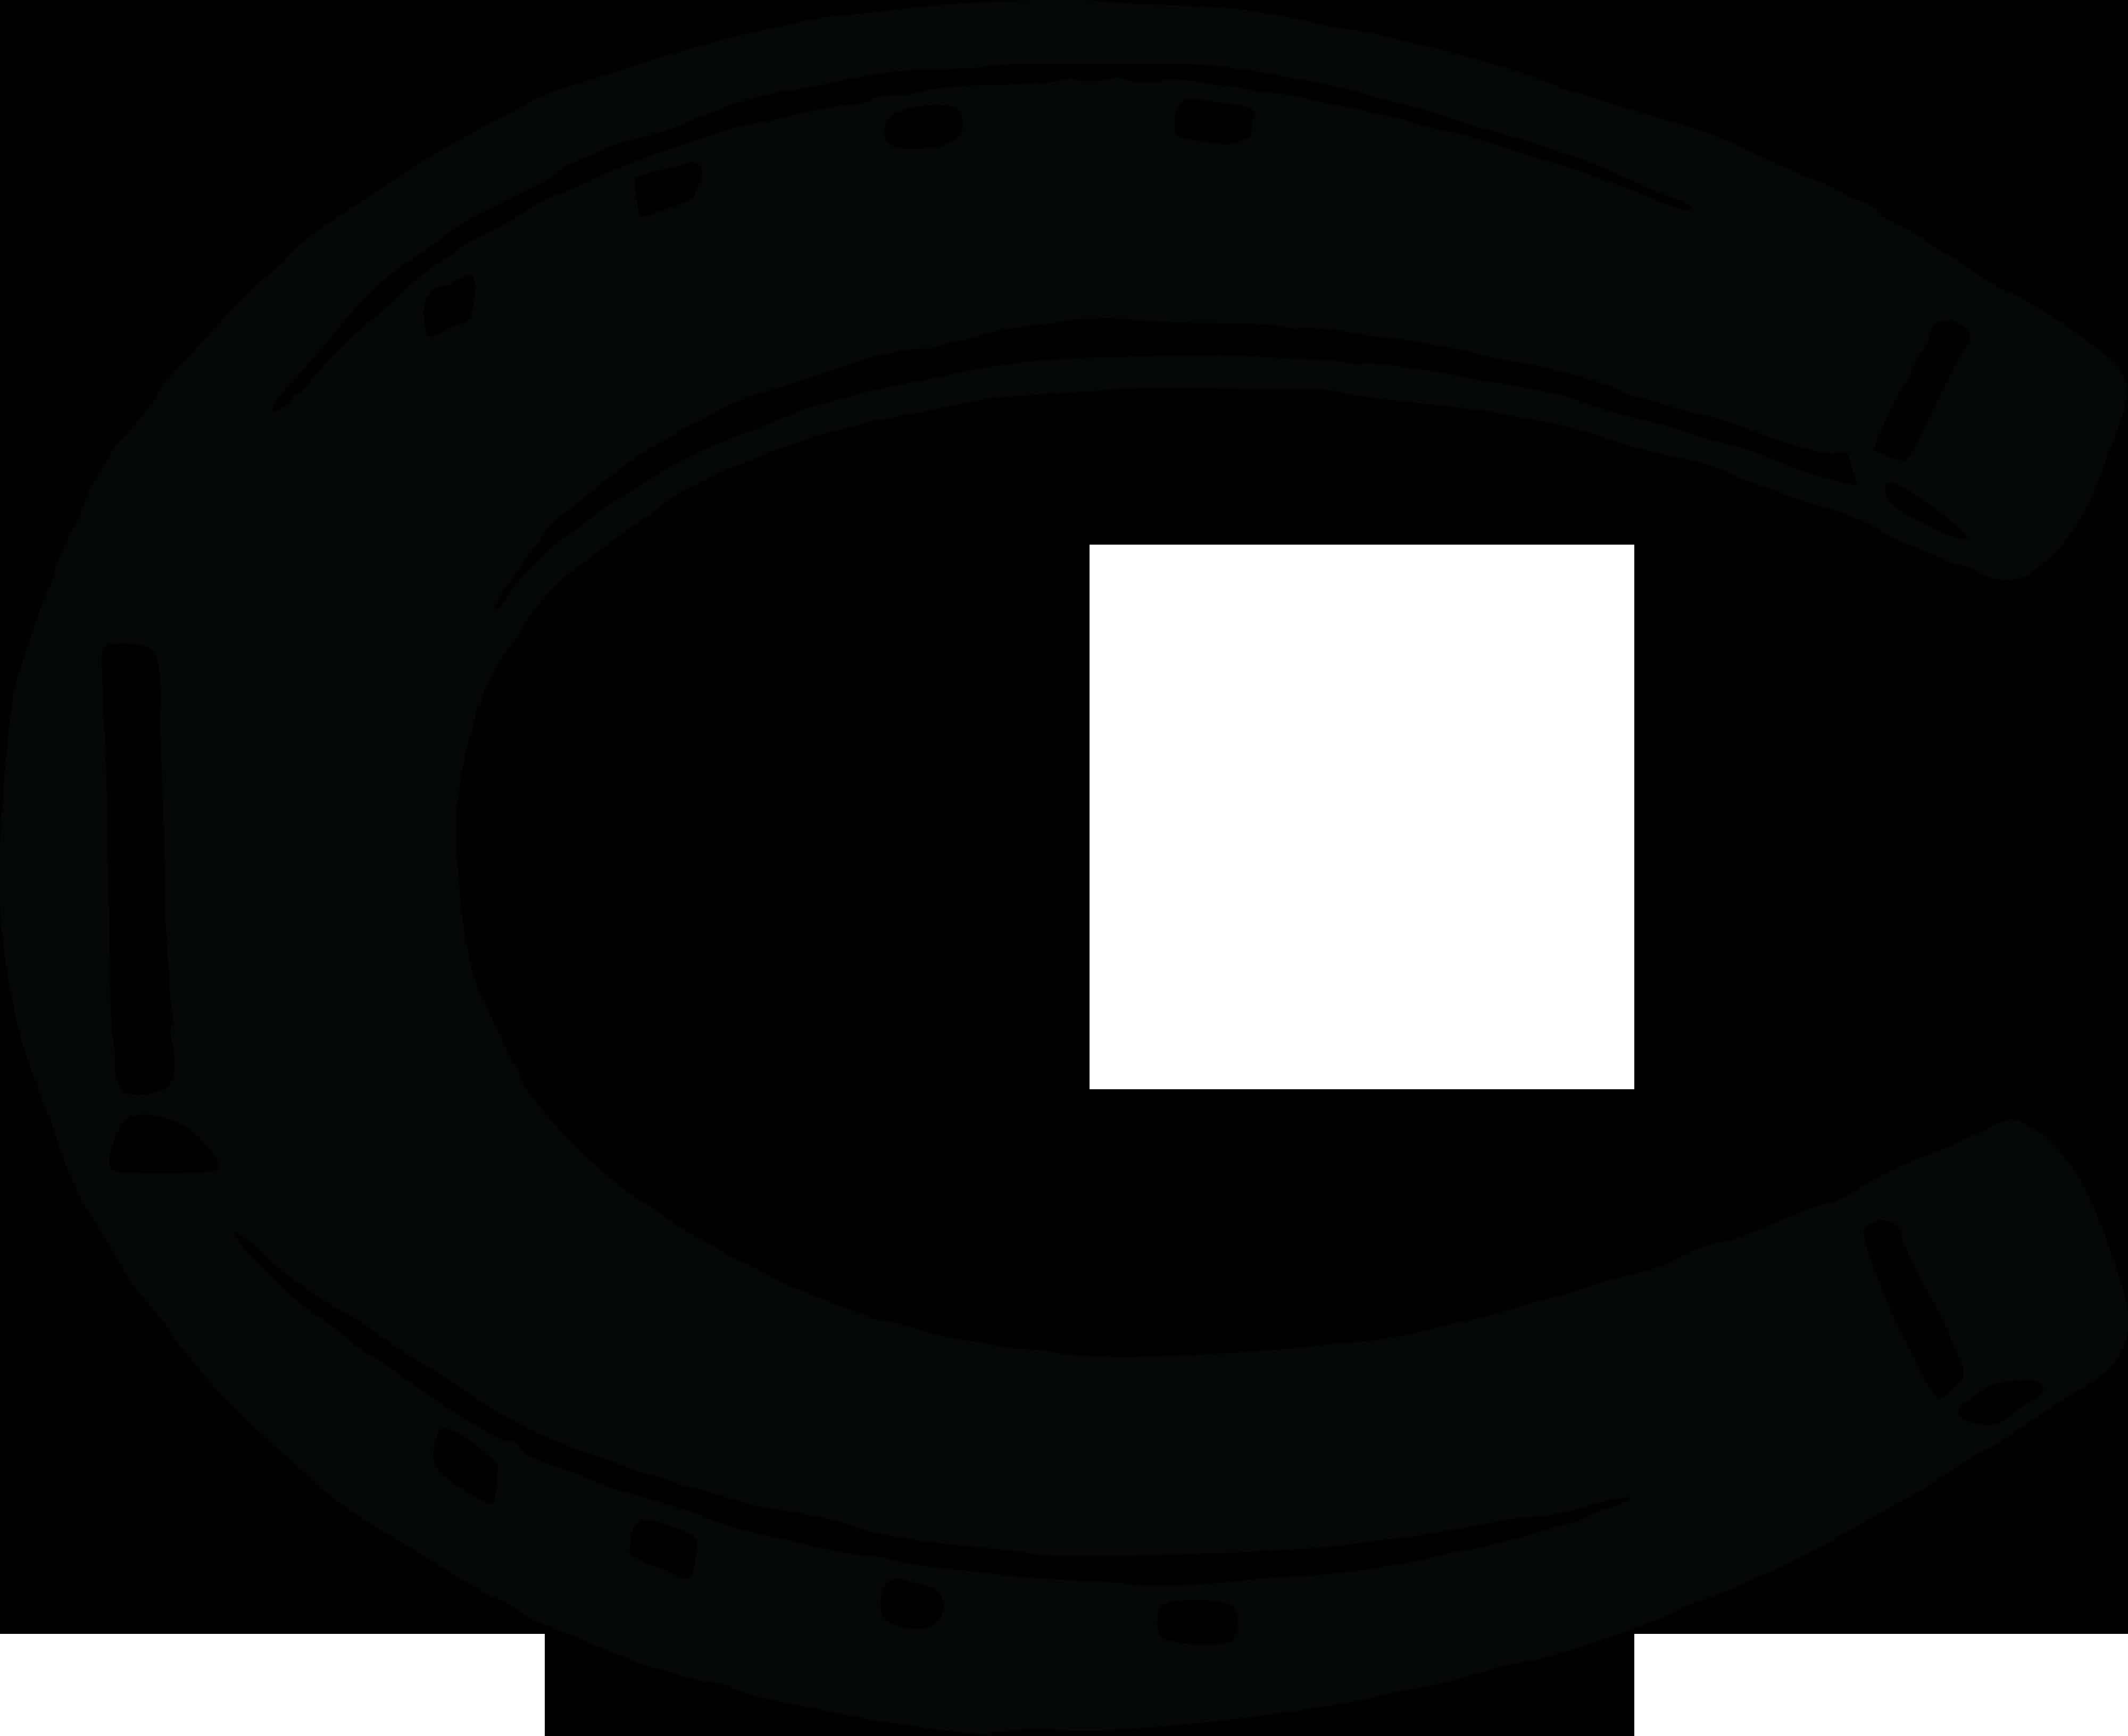 Horseshoe Vector Clipart Image Free Stock Public